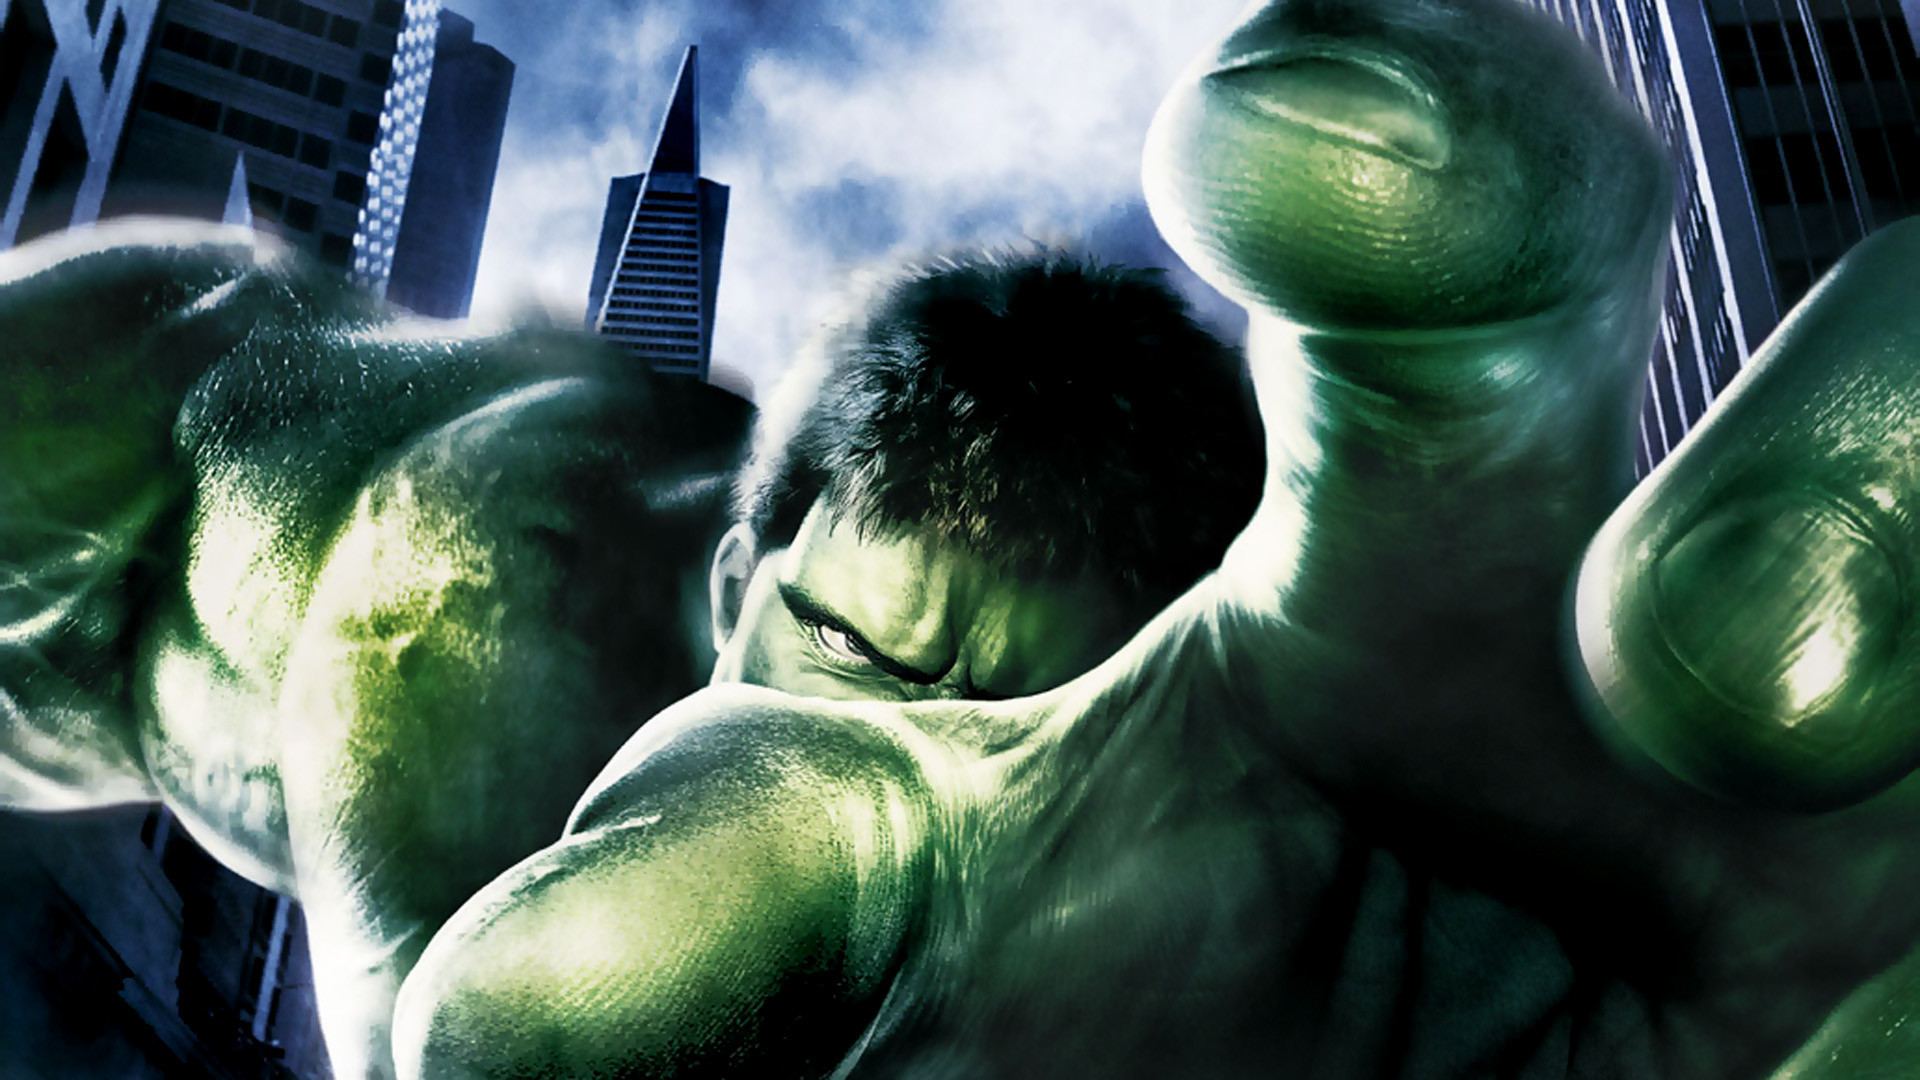 Hulk Movie Wallpapers Hulk Movie Wallpapers HD Wallpapers 1920x1080